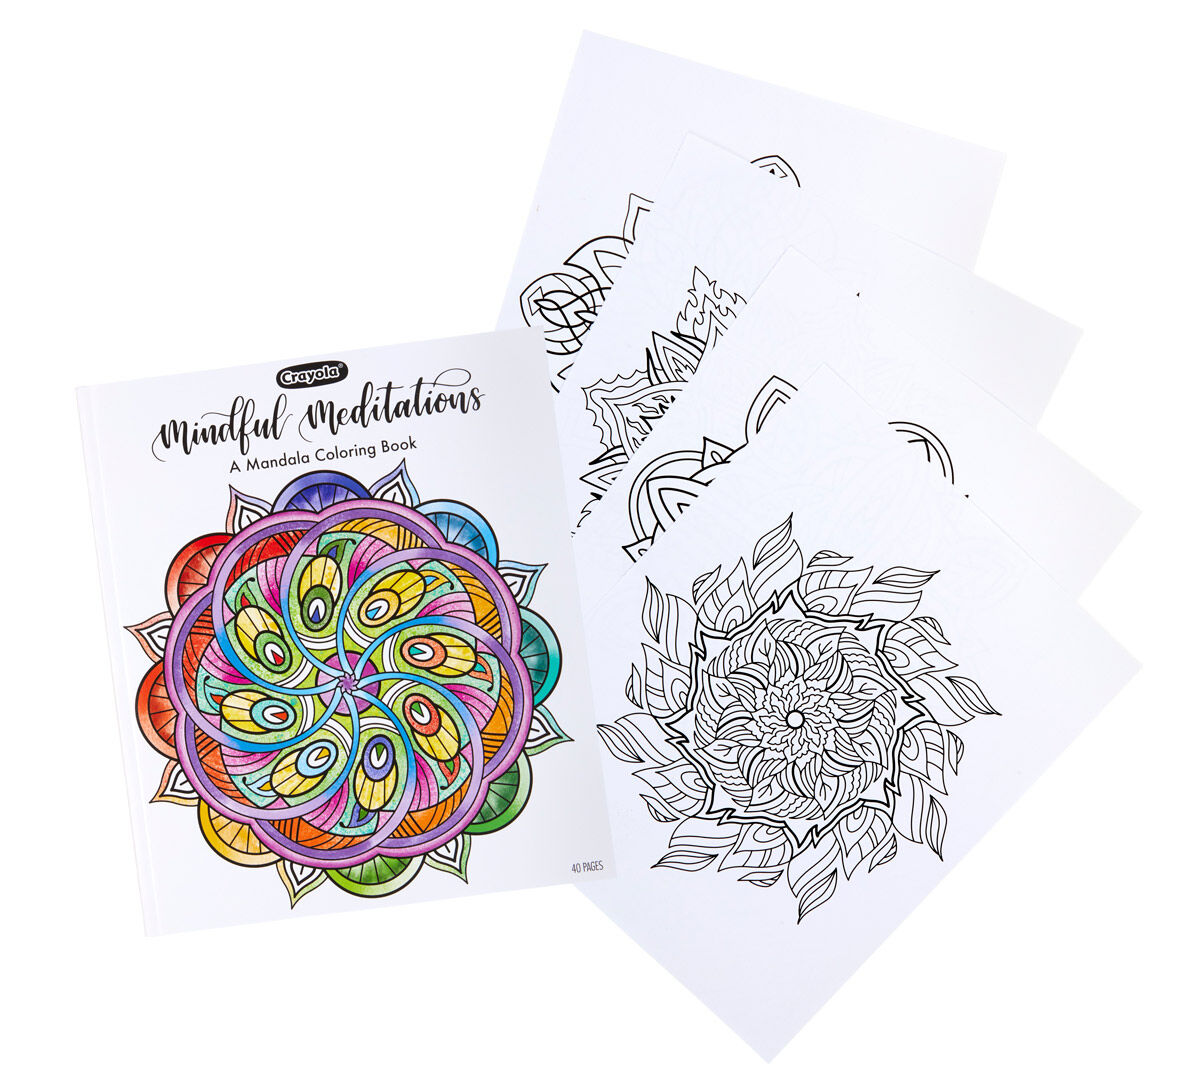 - Mandala Coloring Book, 40 Coloring Pages Crayola.com Crayola